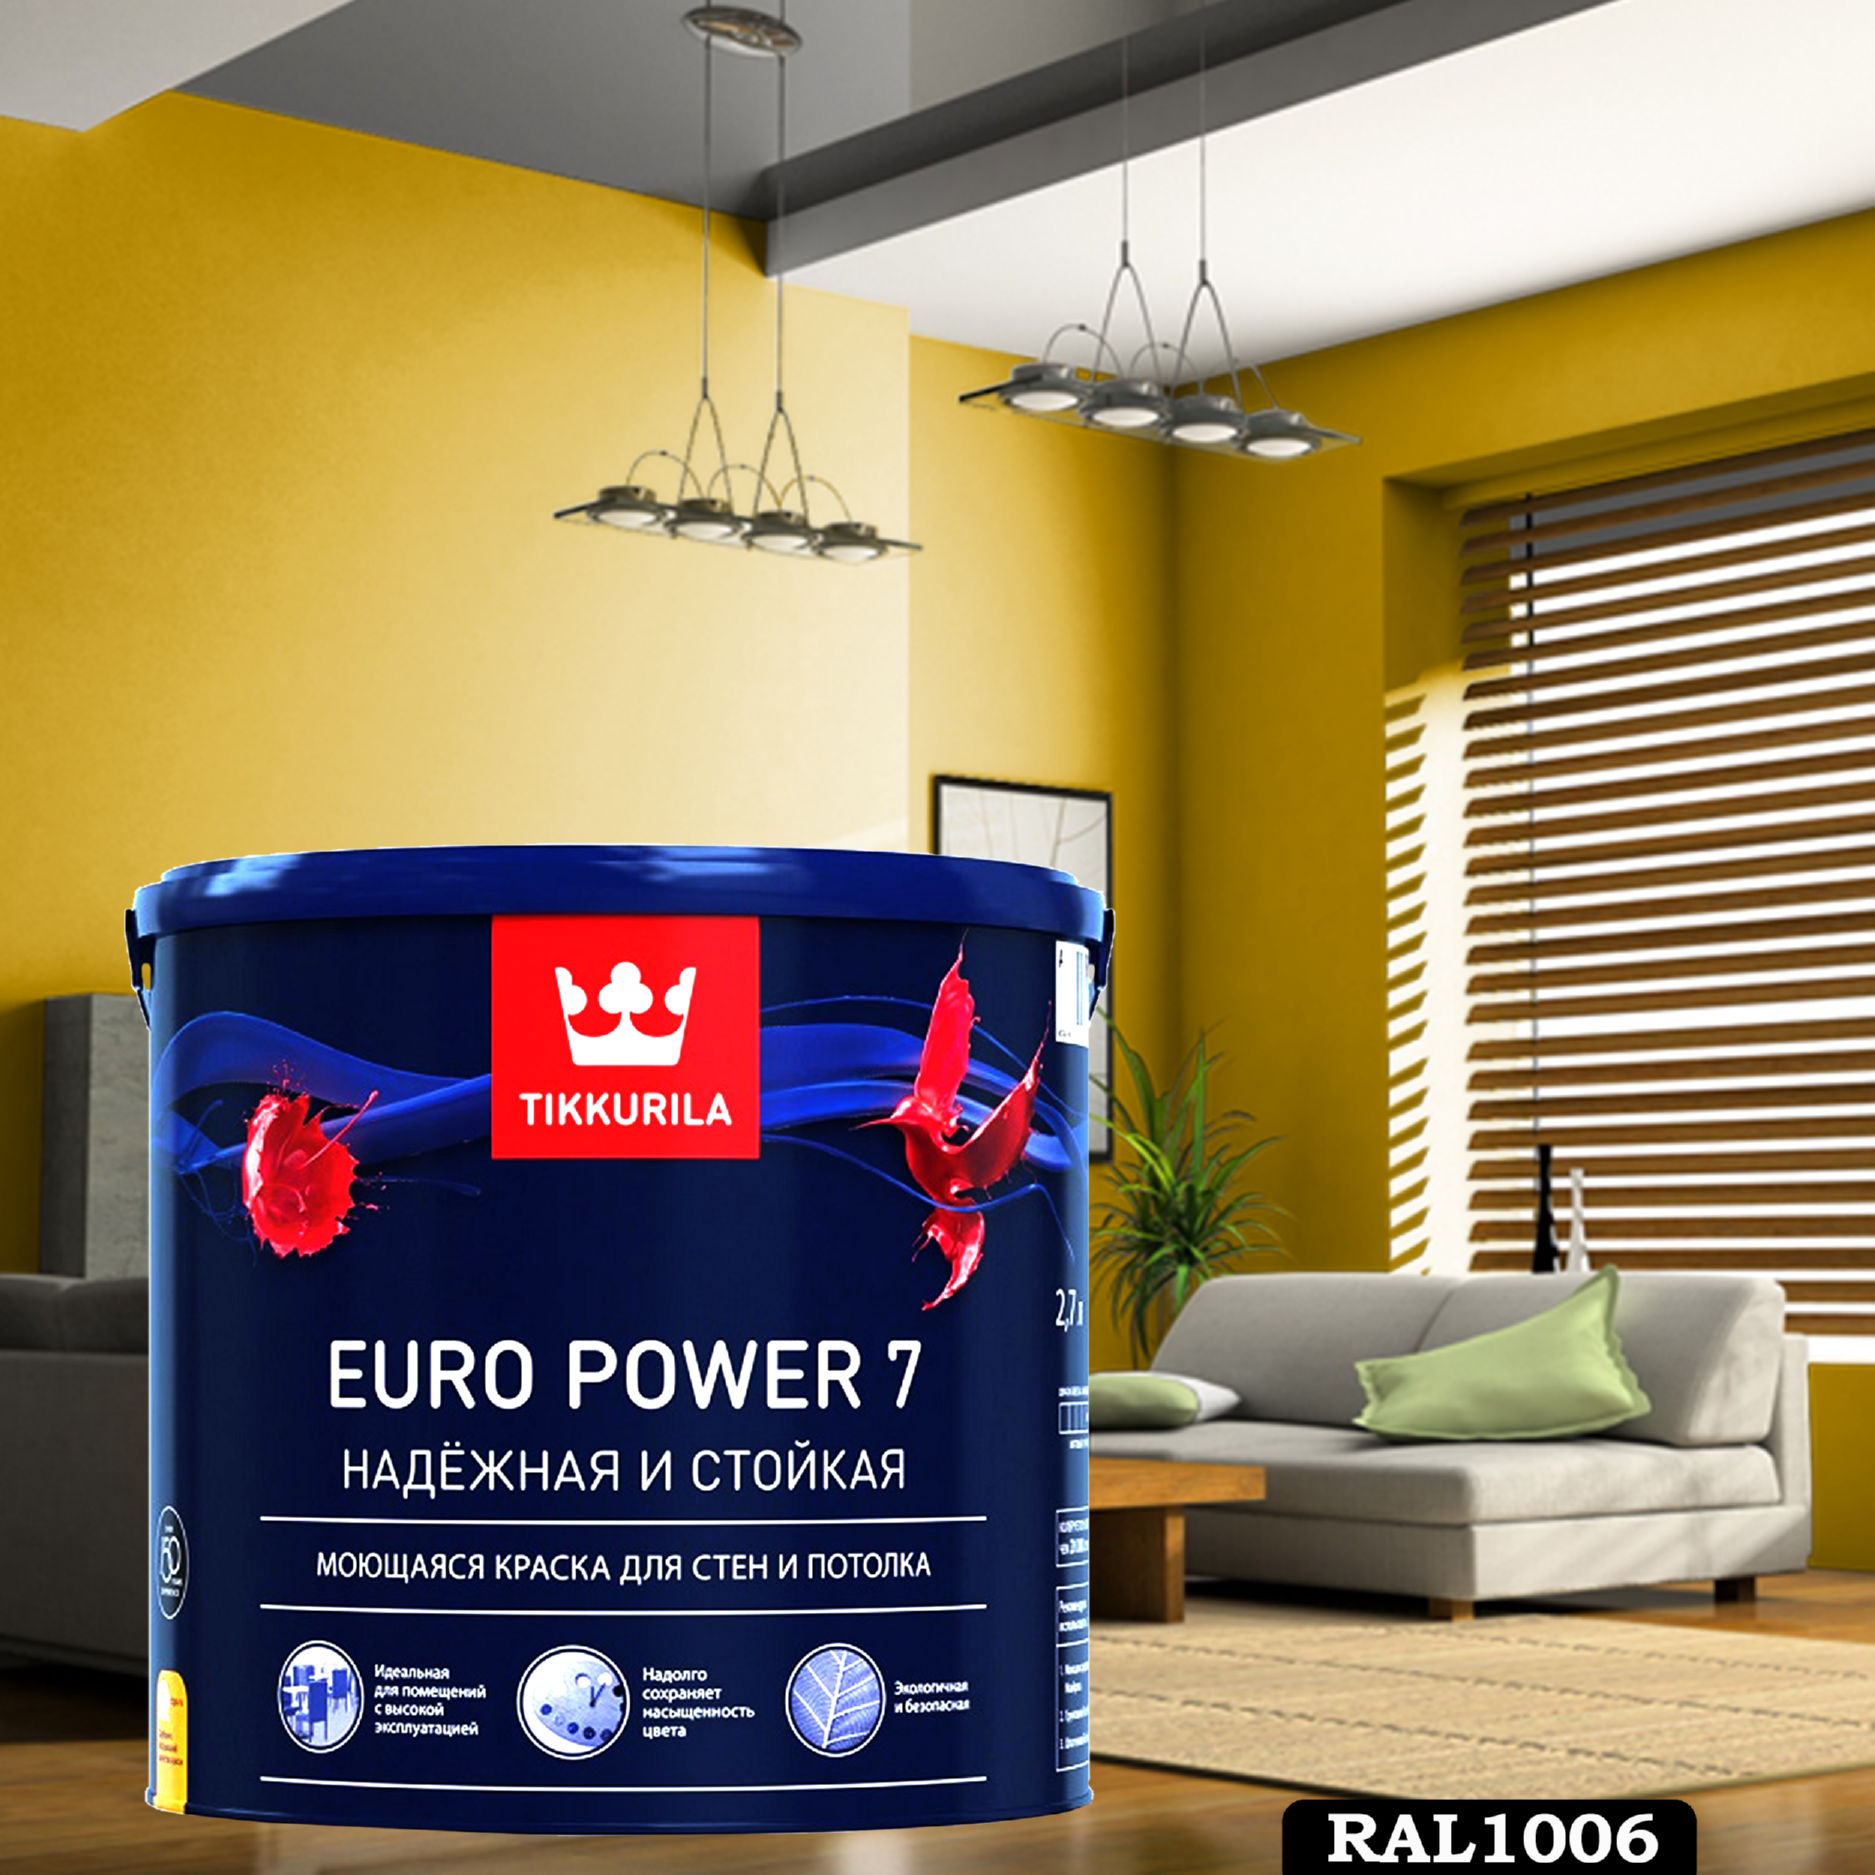 Фото 7 - Краска TIKKURILA Euro Power 7,  RAL 1006 Кукурузно-жёлтый, латексная моющаяся матовая интерьерная, 9 л.